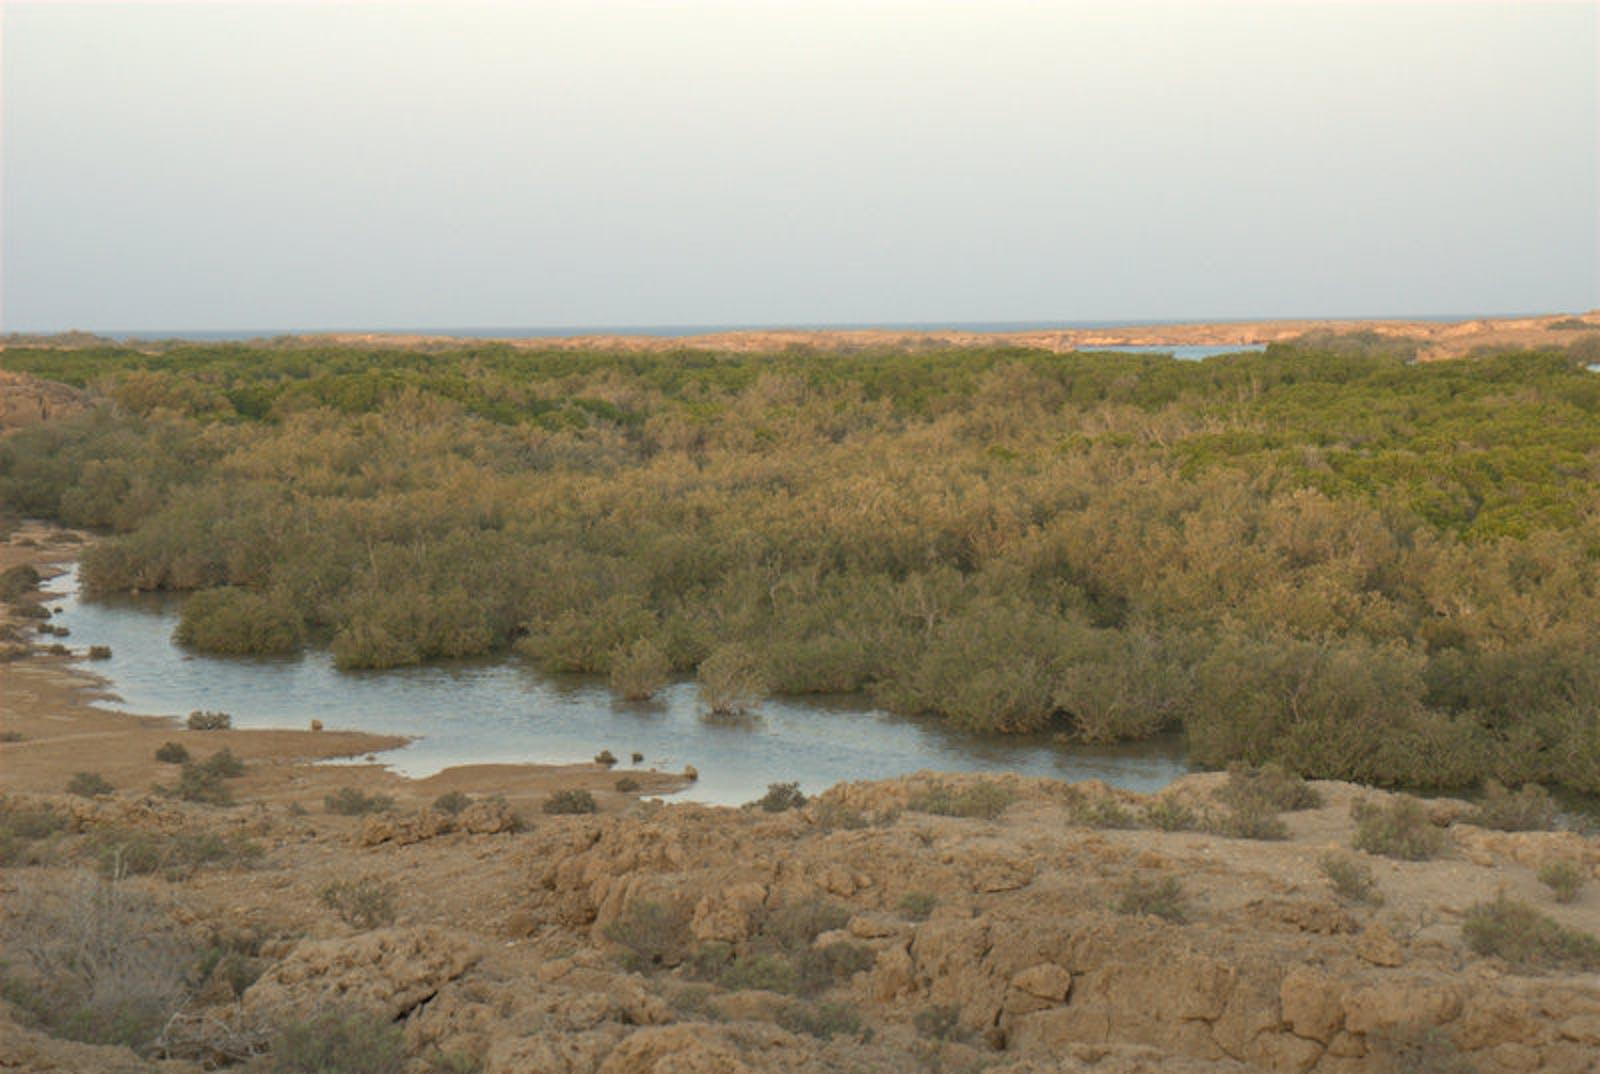 Red Sea Mangroves